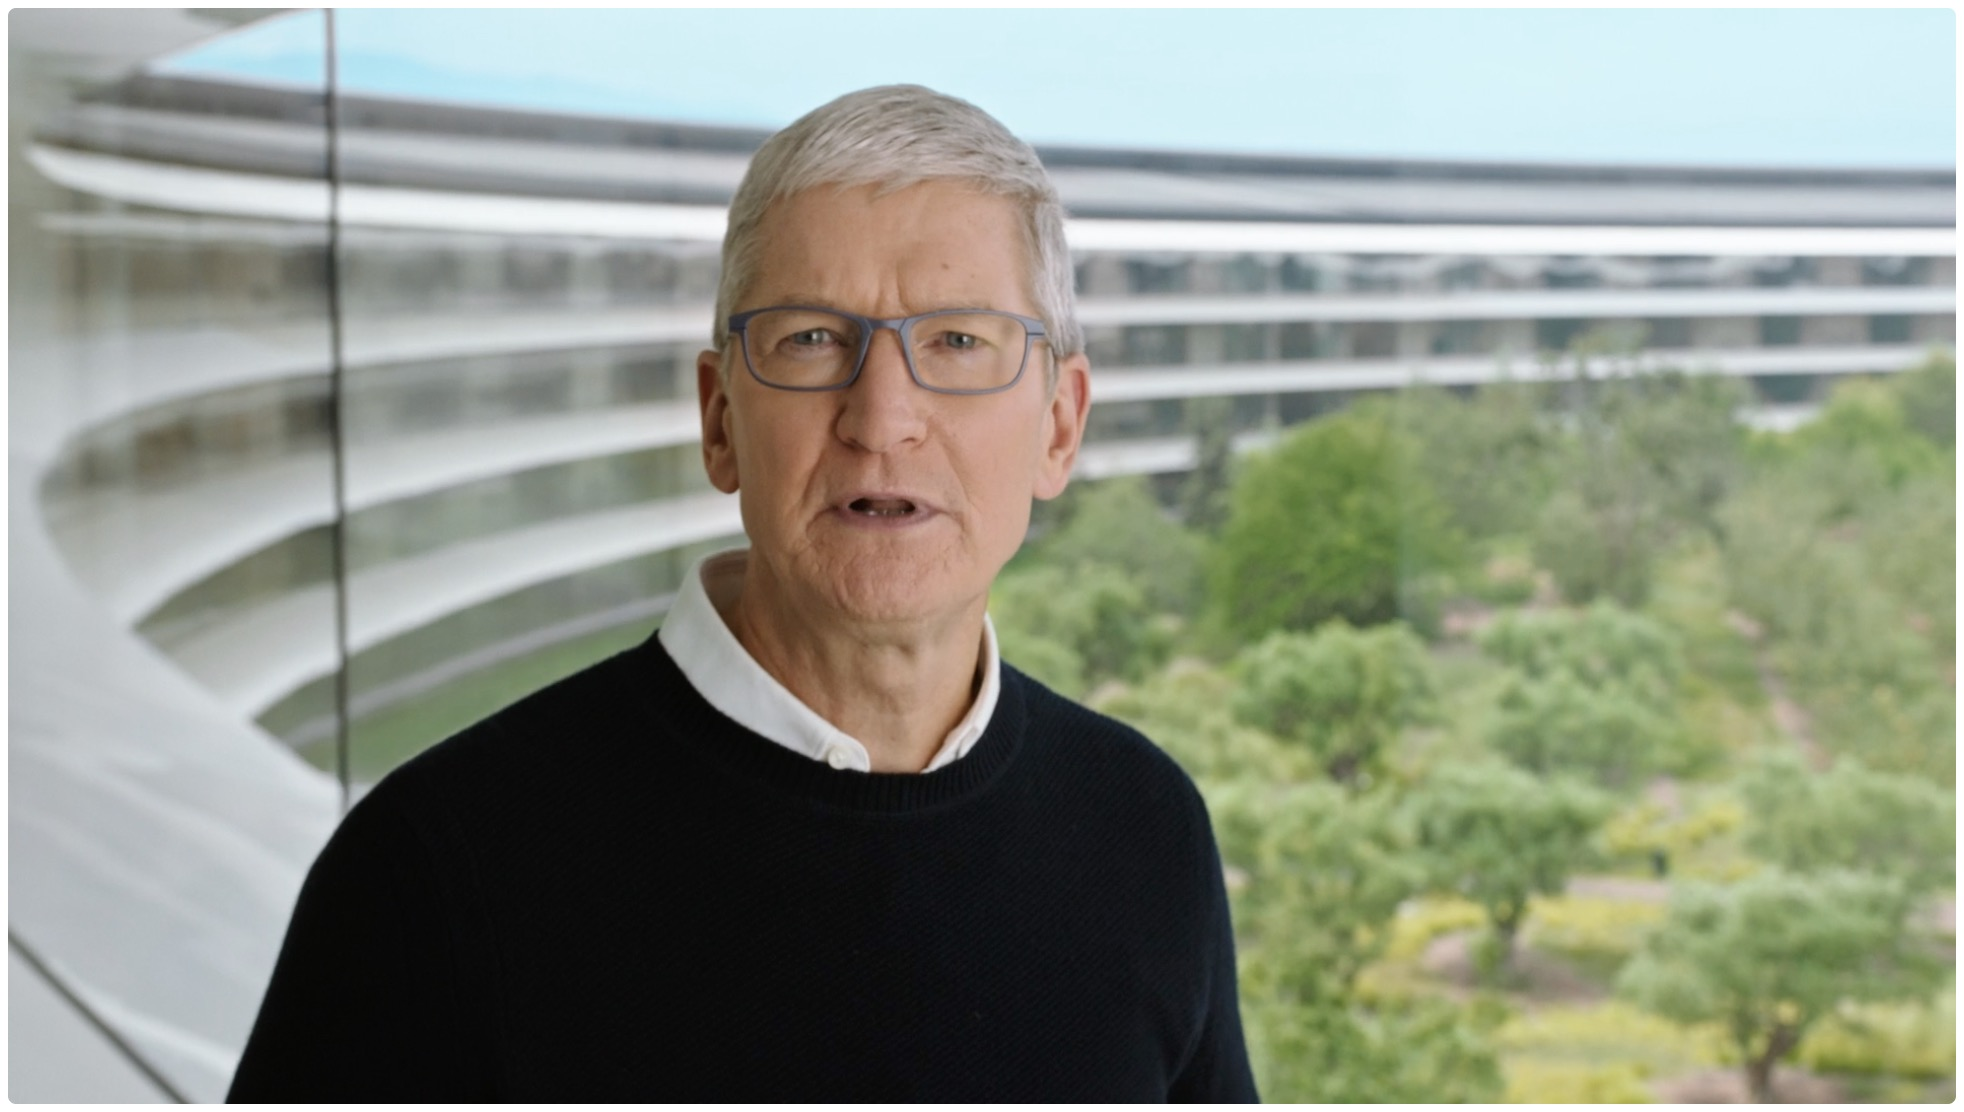 Apple CEO Tim Cook inside the Apple Park headquarters